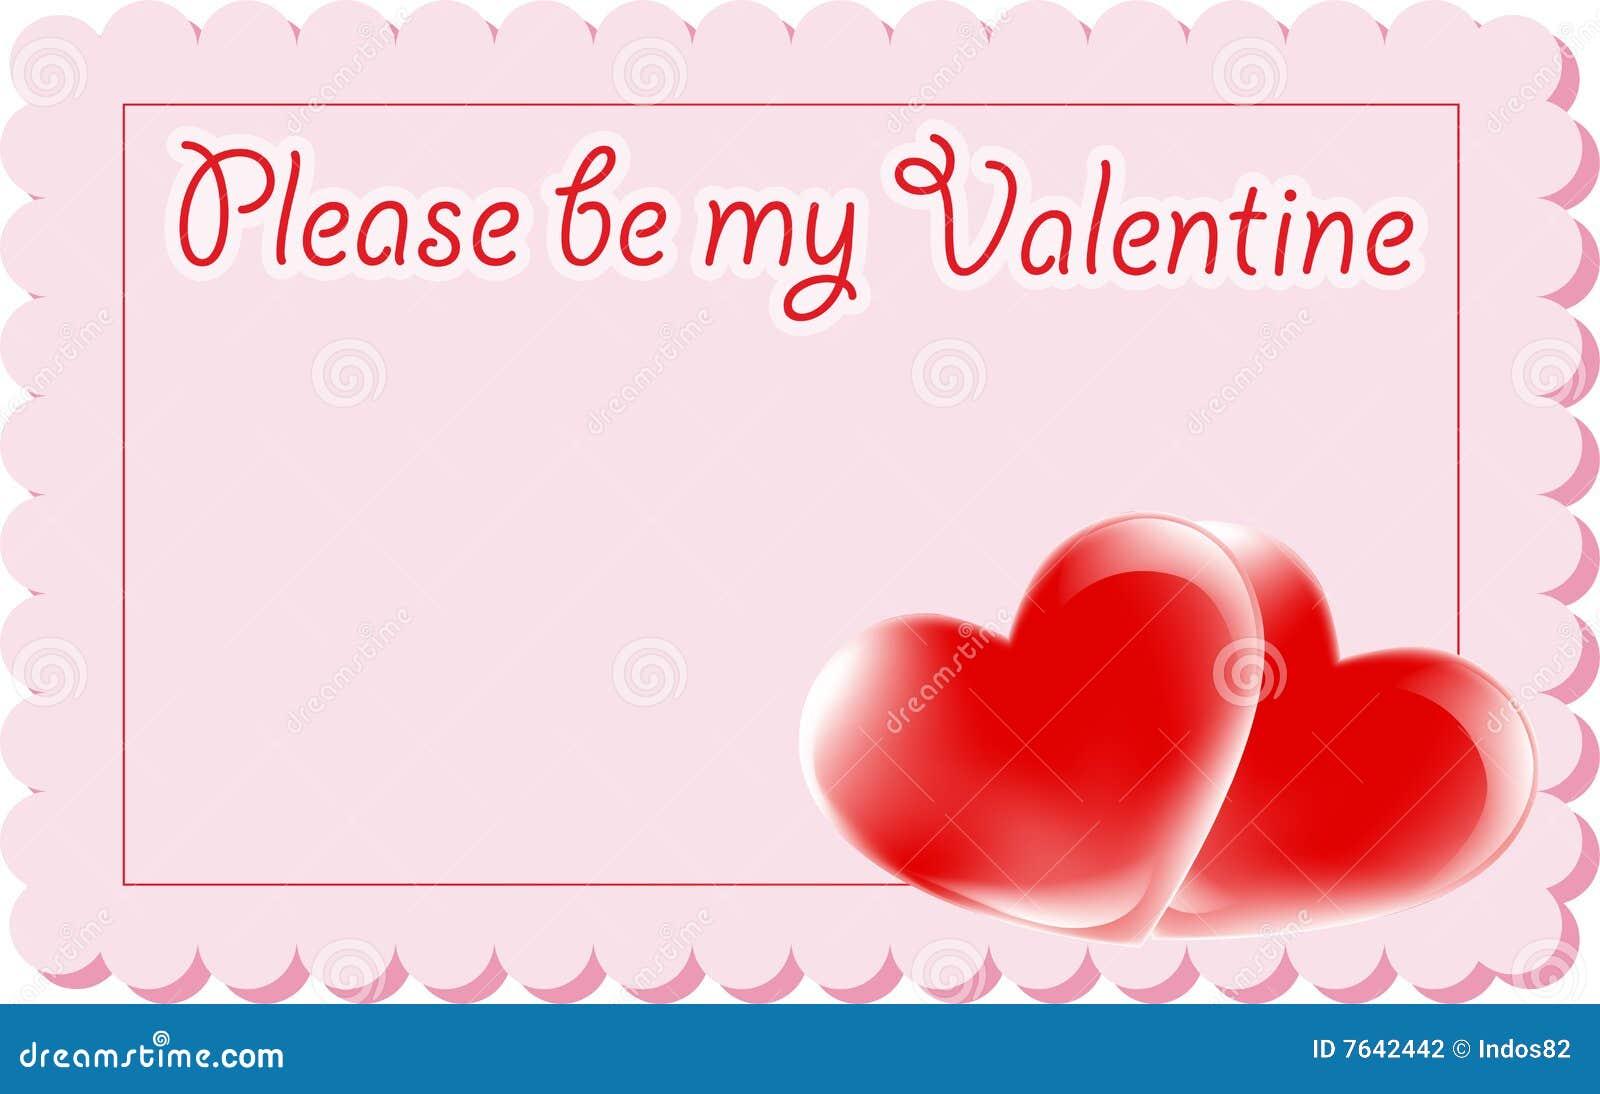 valentines card image